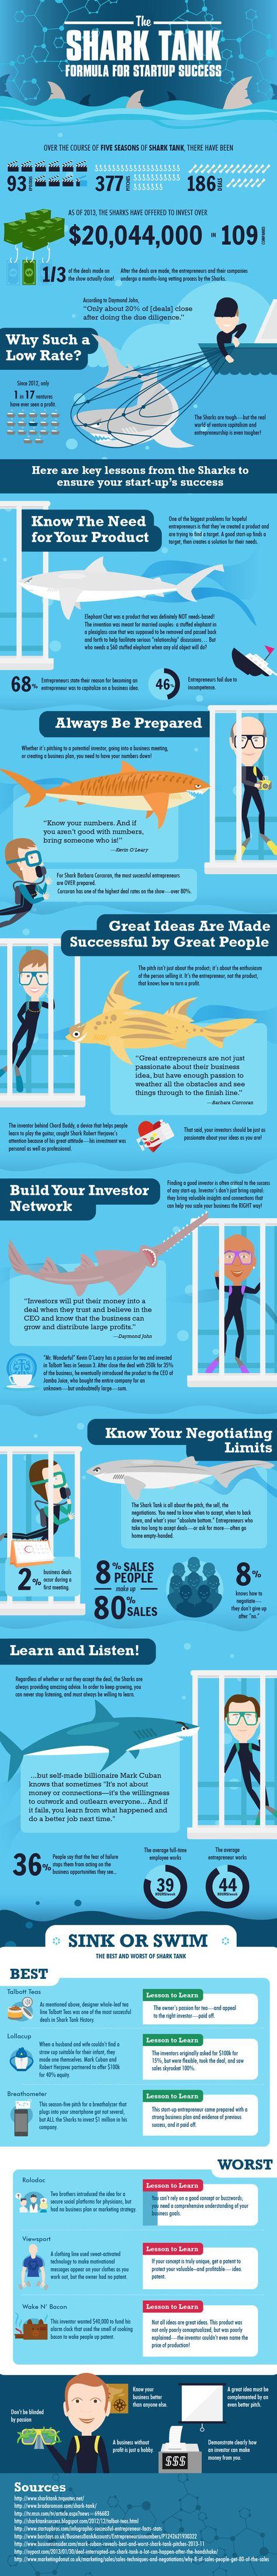 The Shark Tank Formula for Startup Success